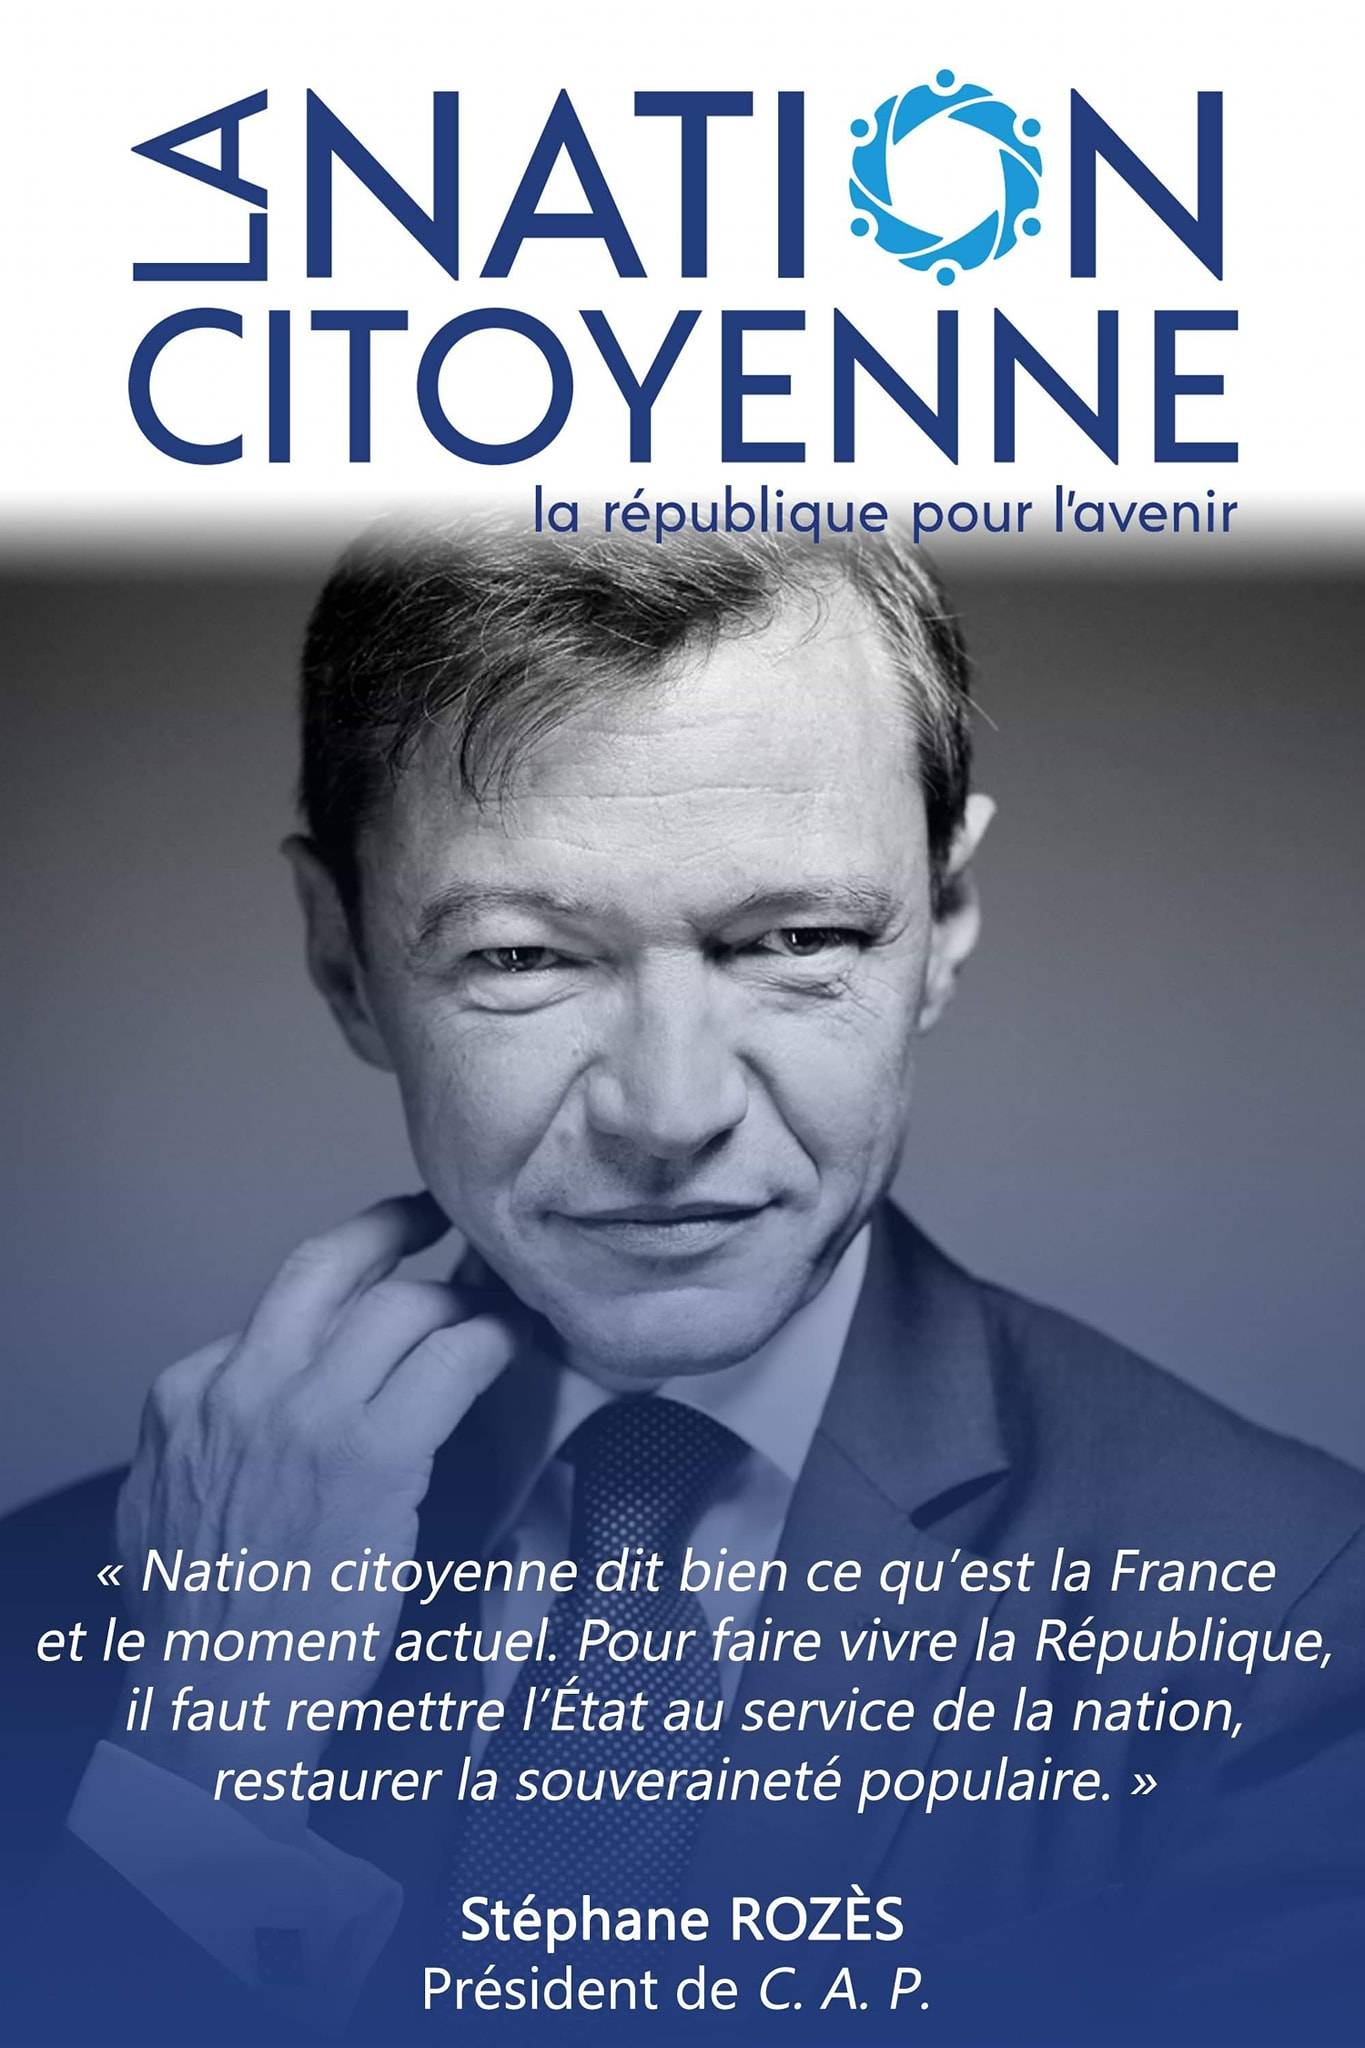 Stéphane Nation